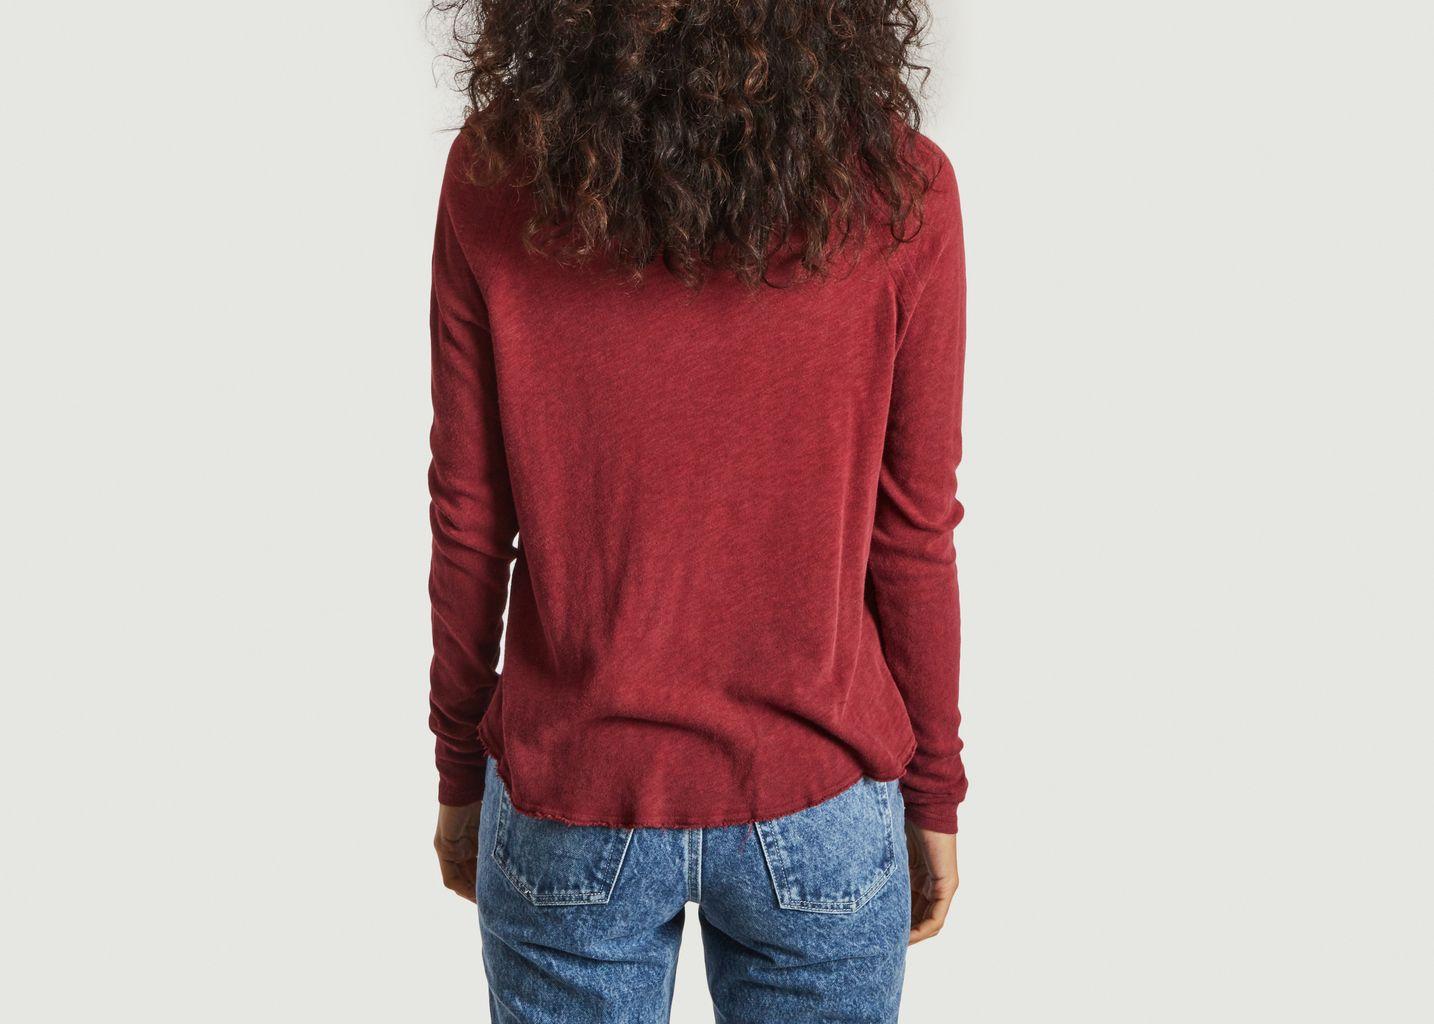 T-shirt Sonoma - American Vintage